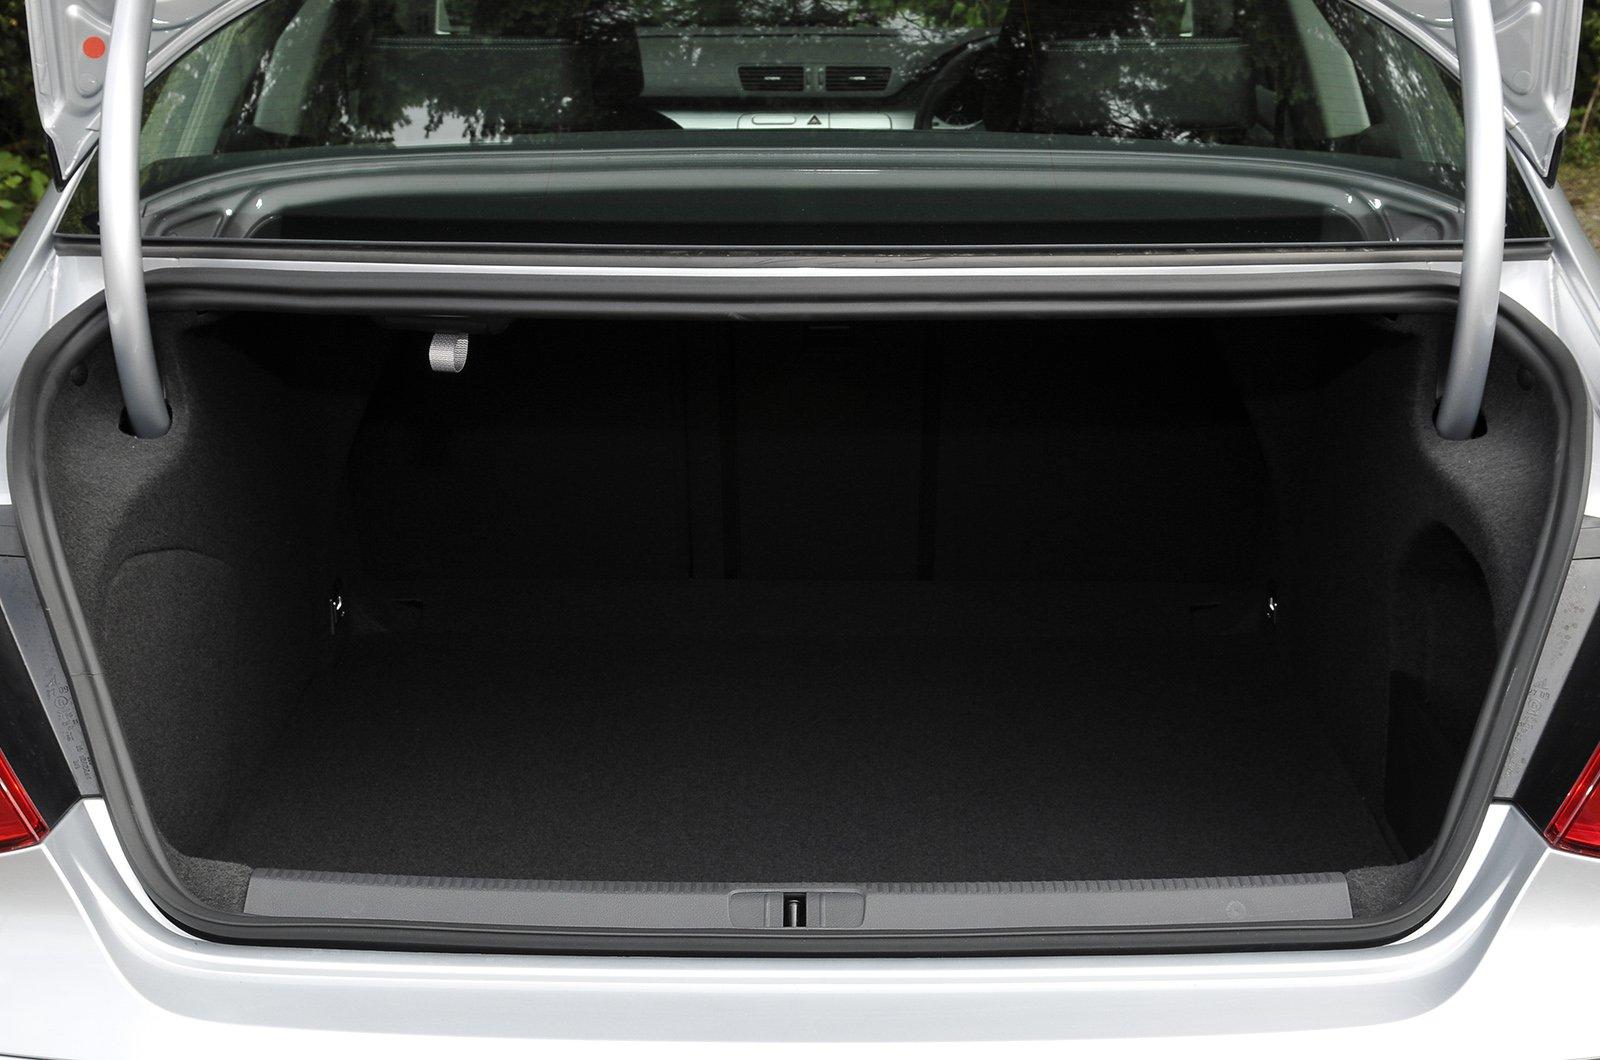 Used Volkswagen CC 2012-2017